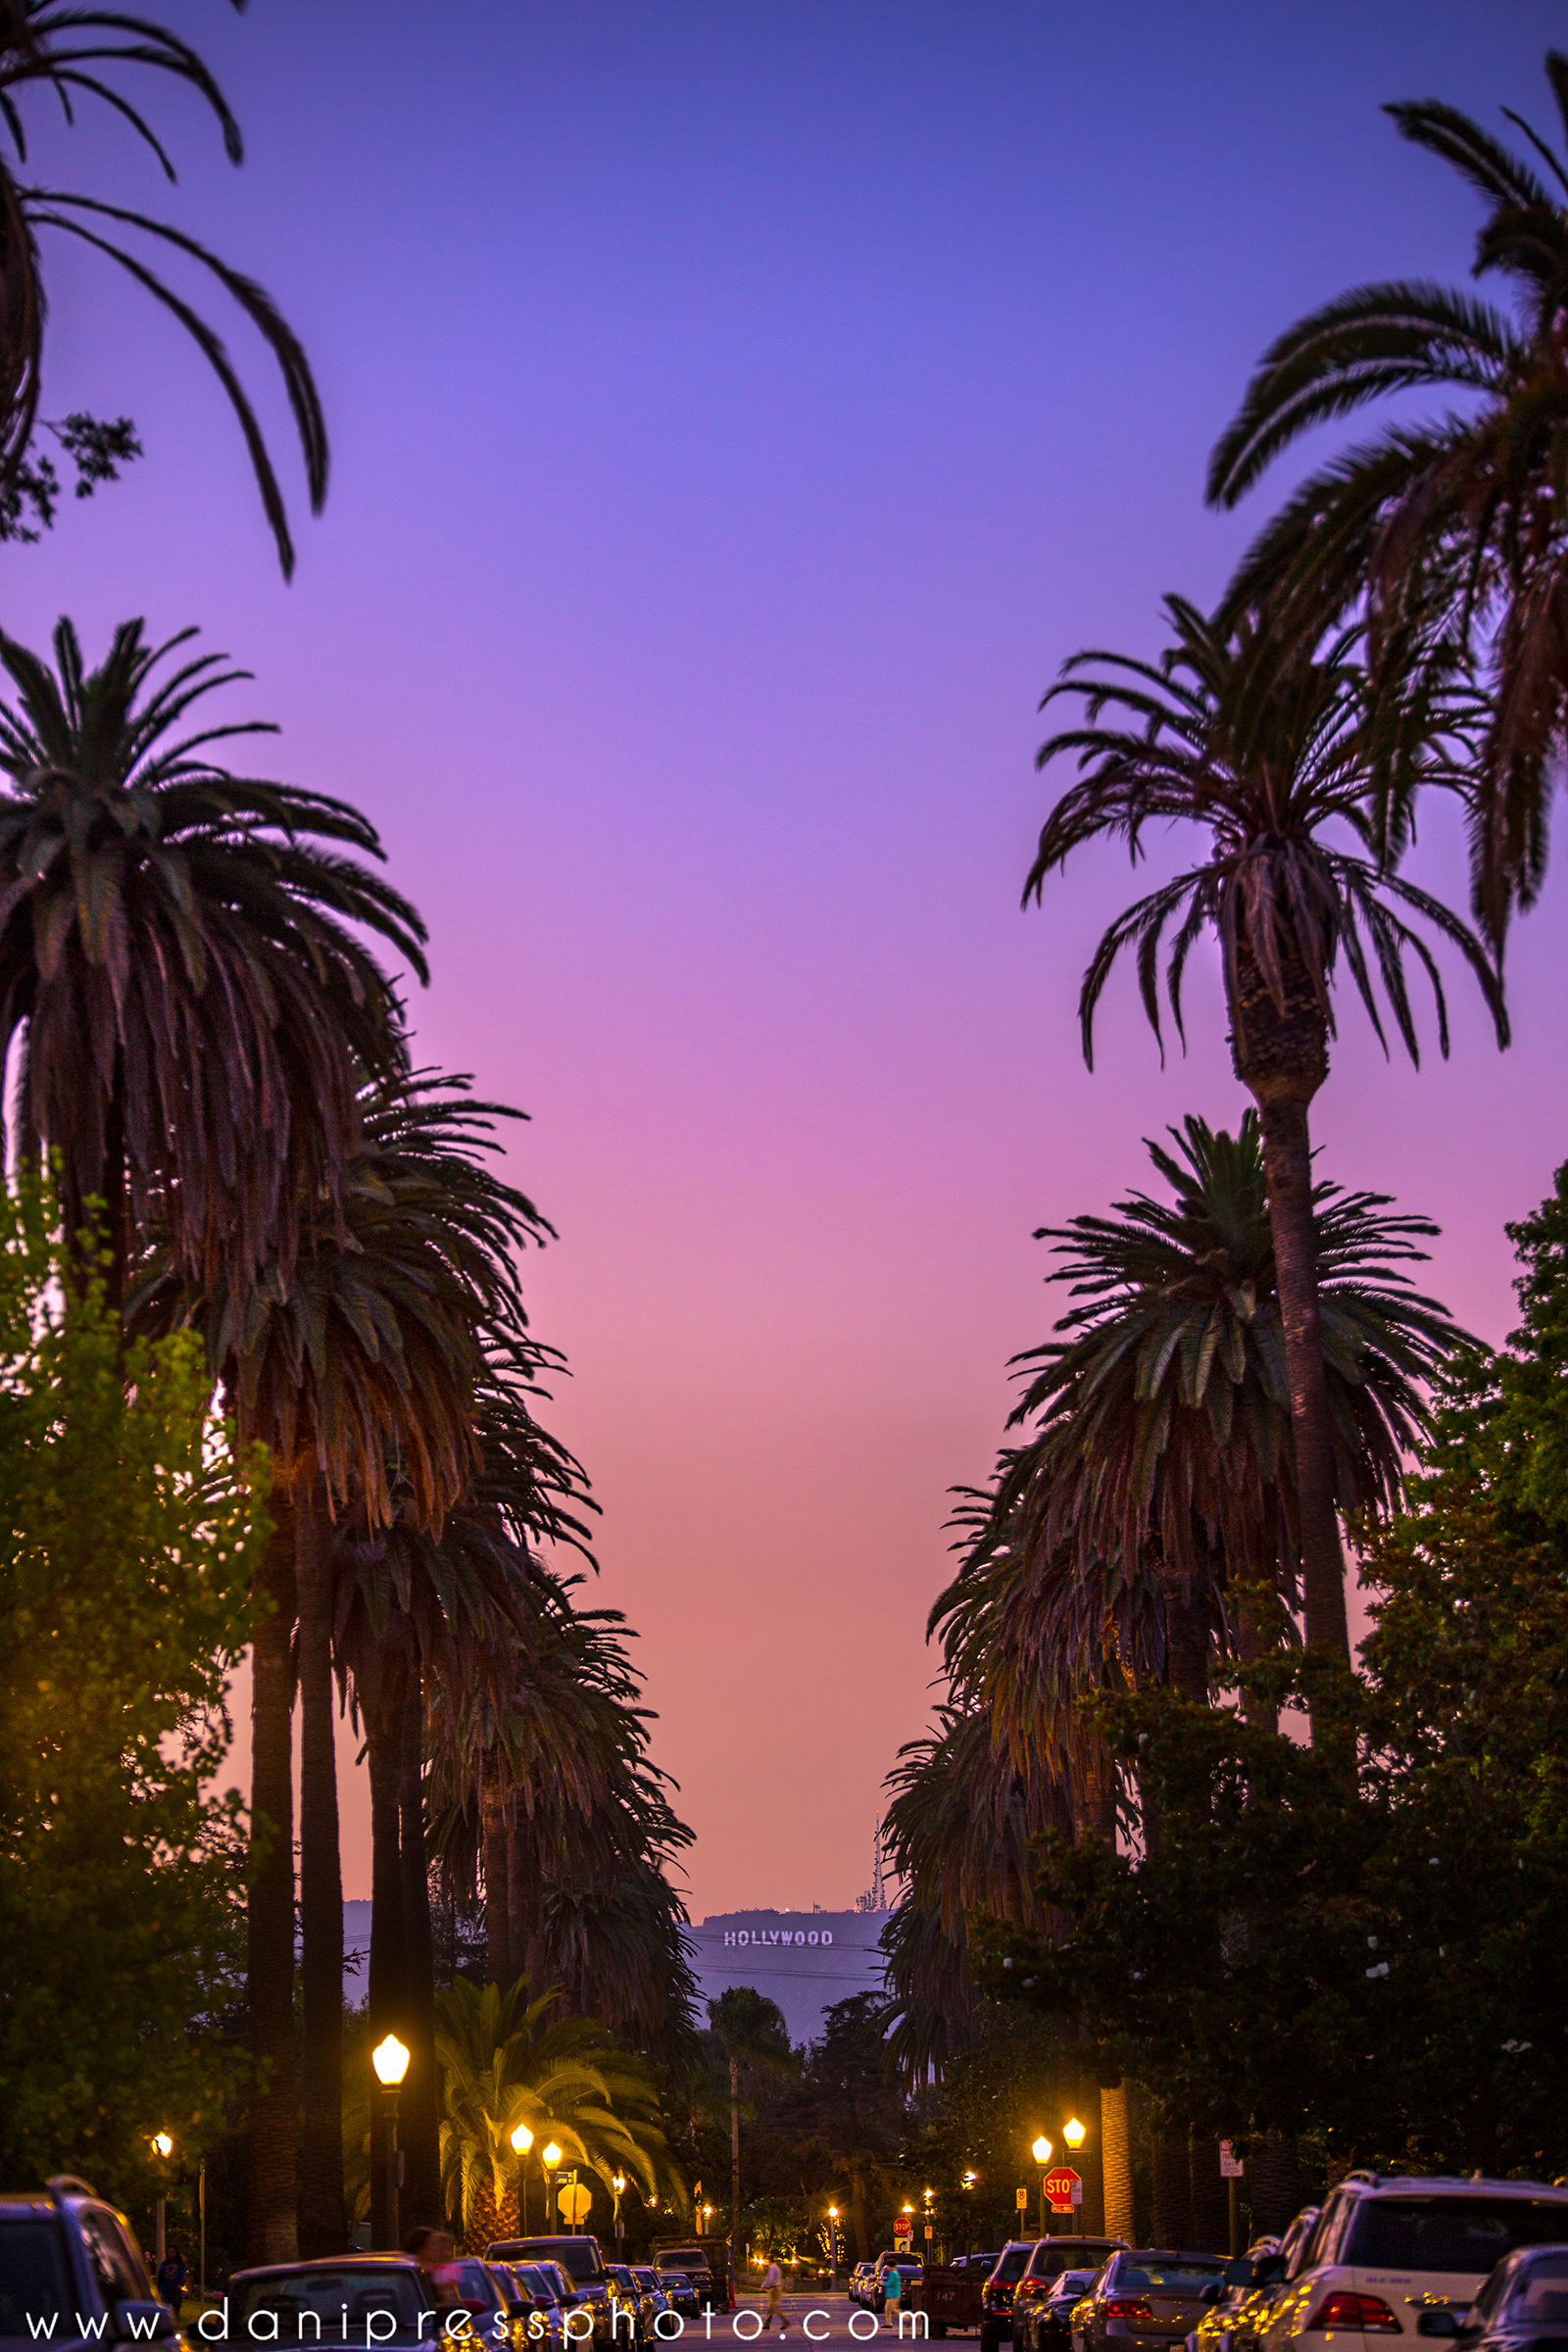 hollywood sign beverly hills los angeles scenic landscape california danielle w lundberg danipress photography.jpg